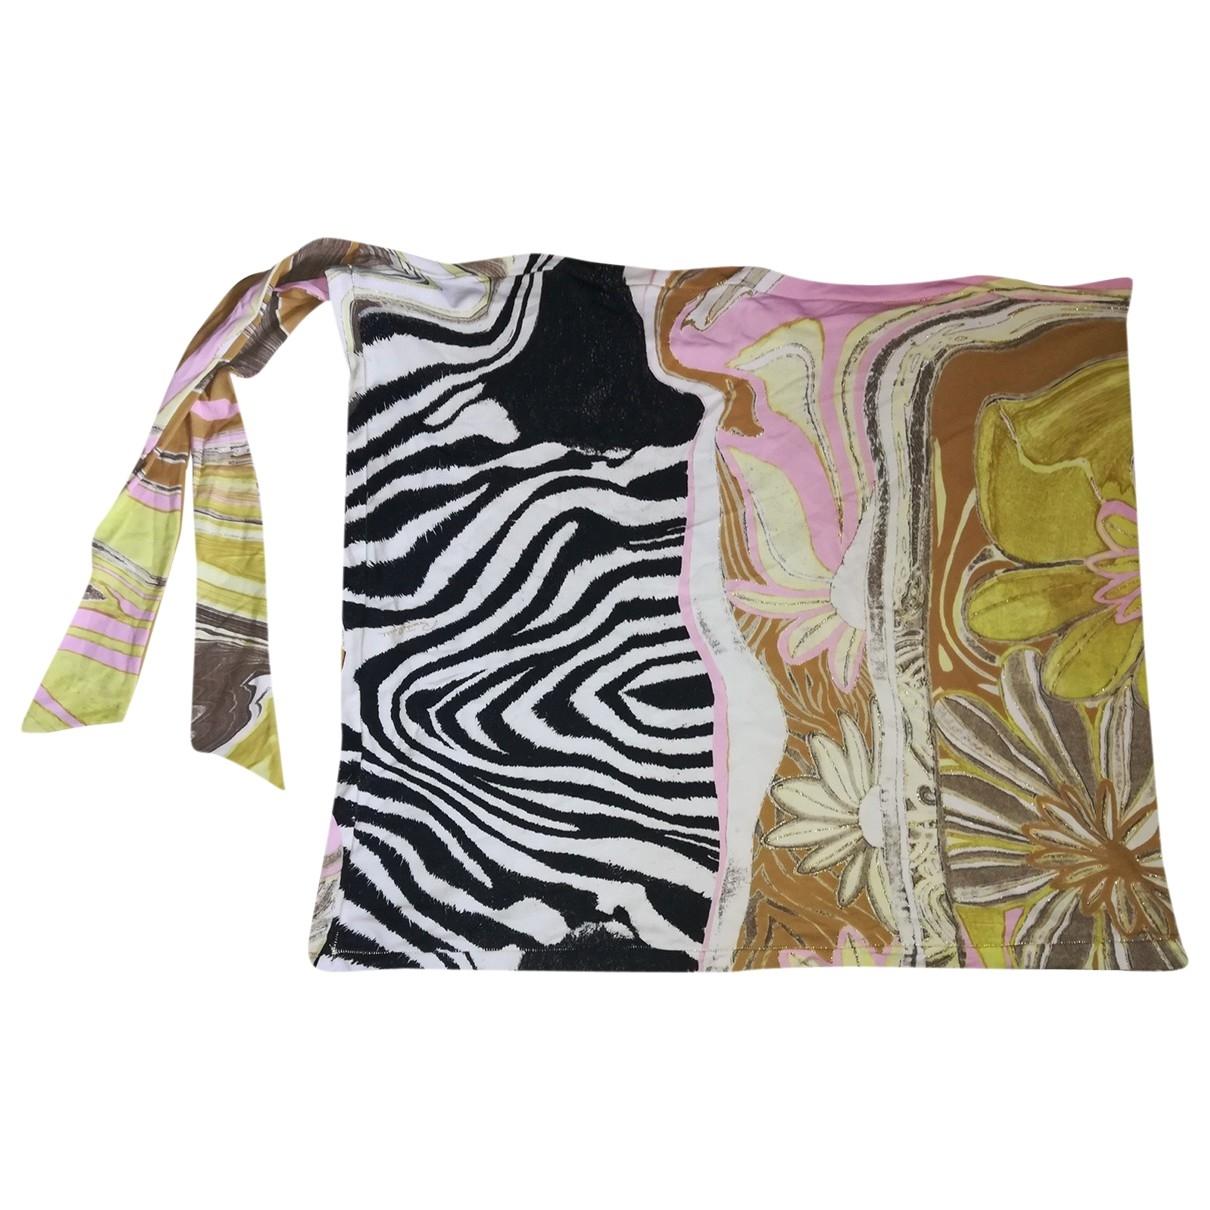 Roberto Cavalli - Jupe   pour femme - multicolore